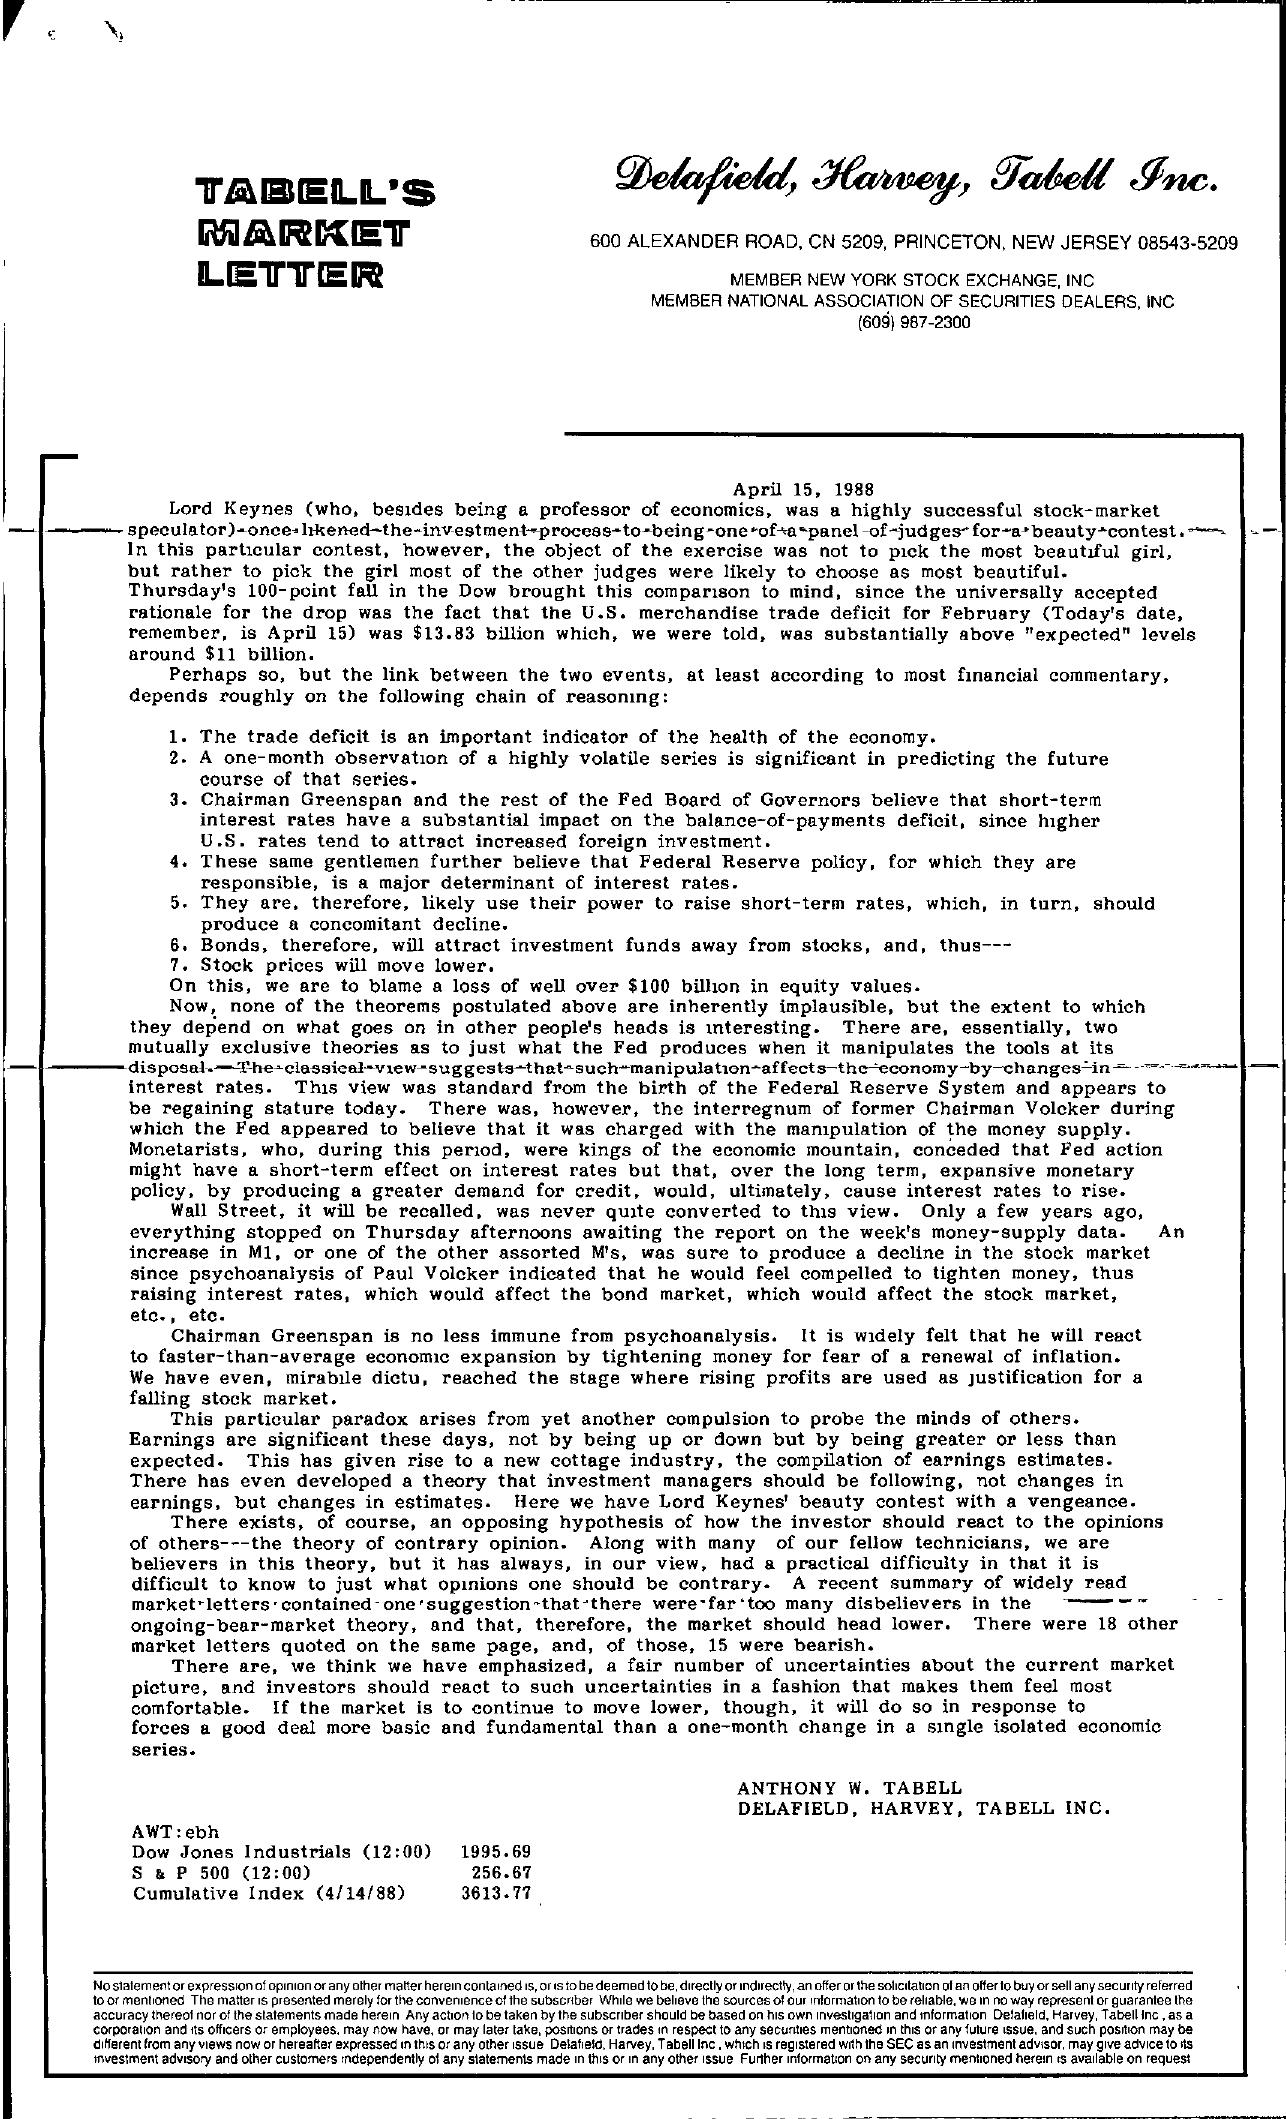 Tabell's Market Letter - April 15, 1988